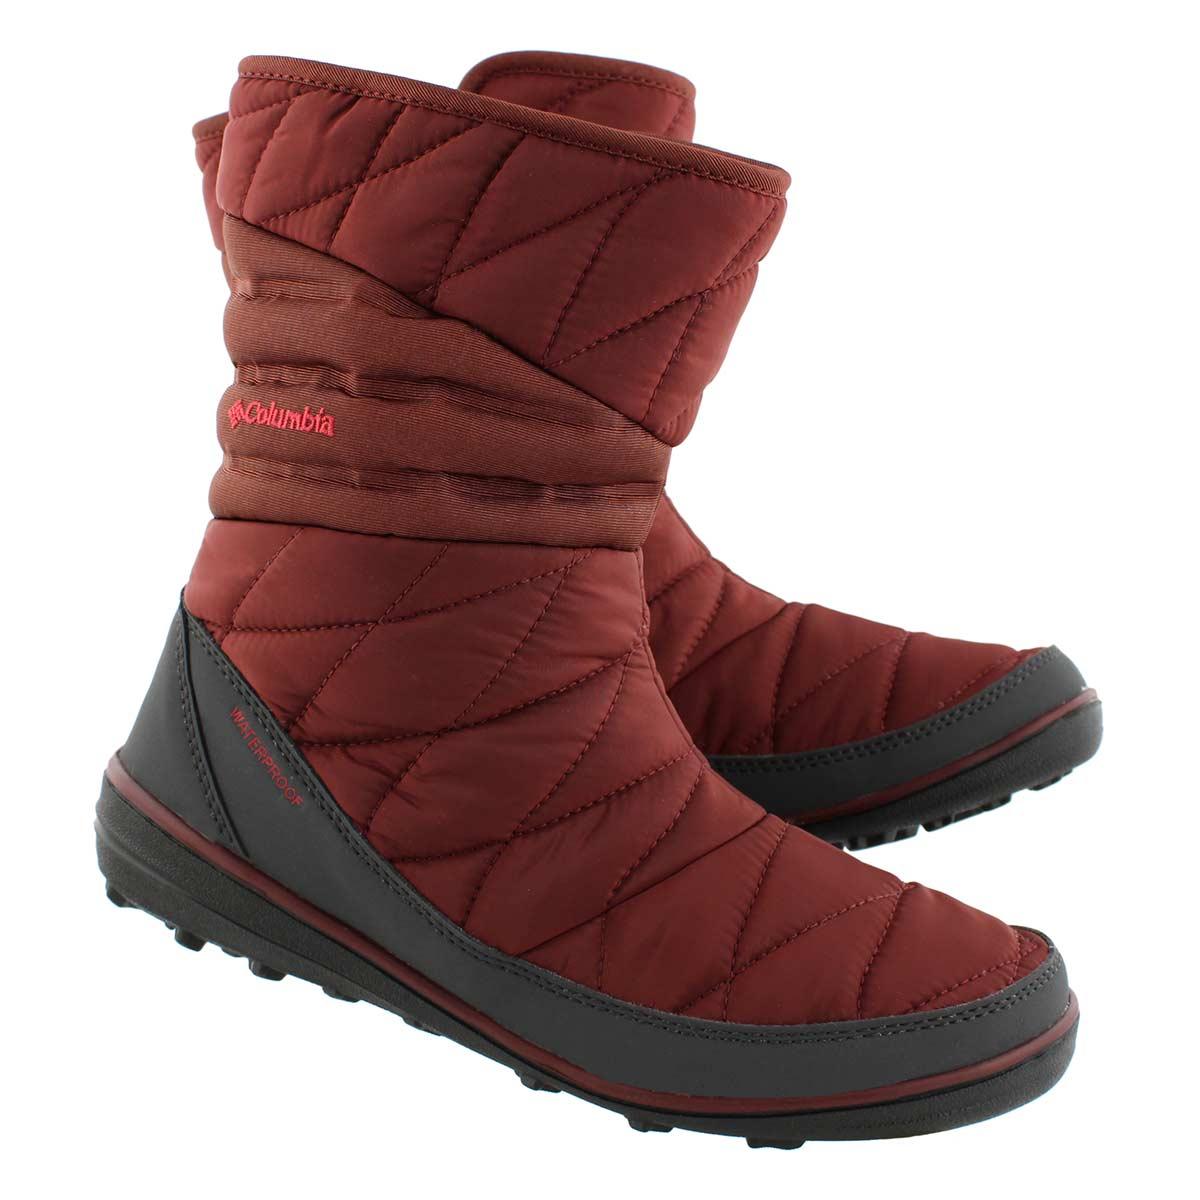 Lds HeavenlySlipII OmniHeat rust wp boot